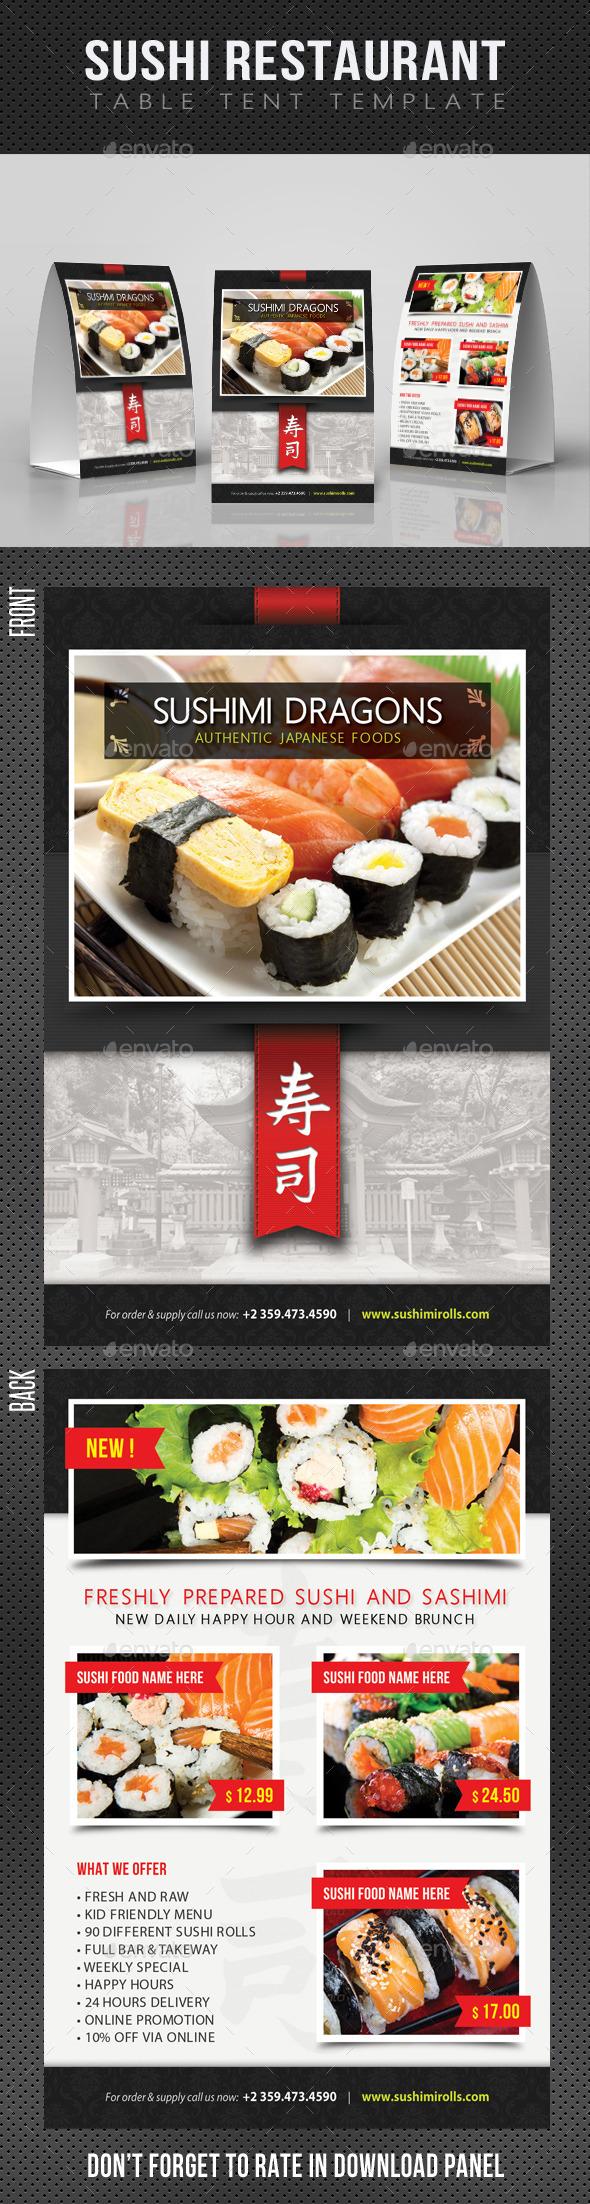 Sushi Restaurant Menu Table Tent V02 - Food Menus Print Templates